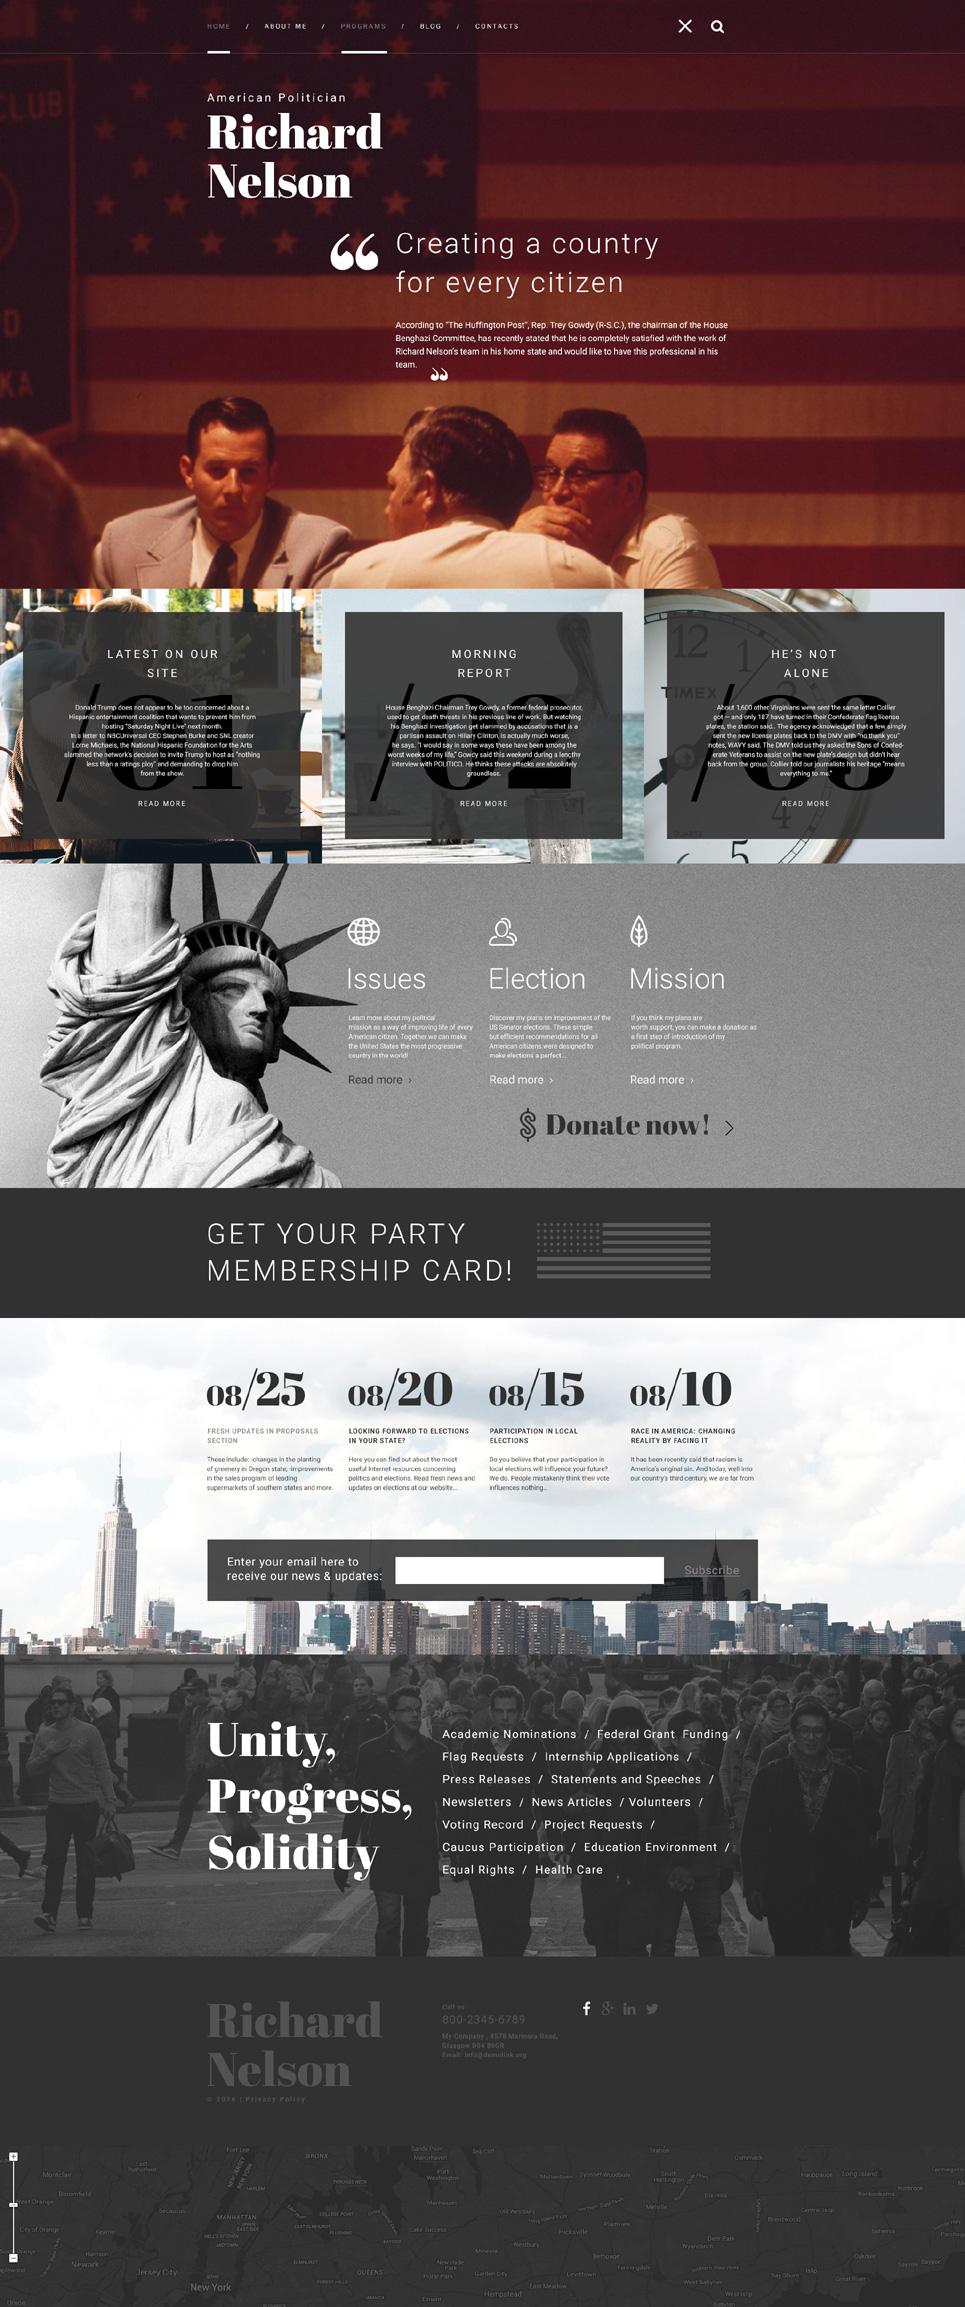 WordPress bundle: 15 Premium Themes - $39 - 58658 big